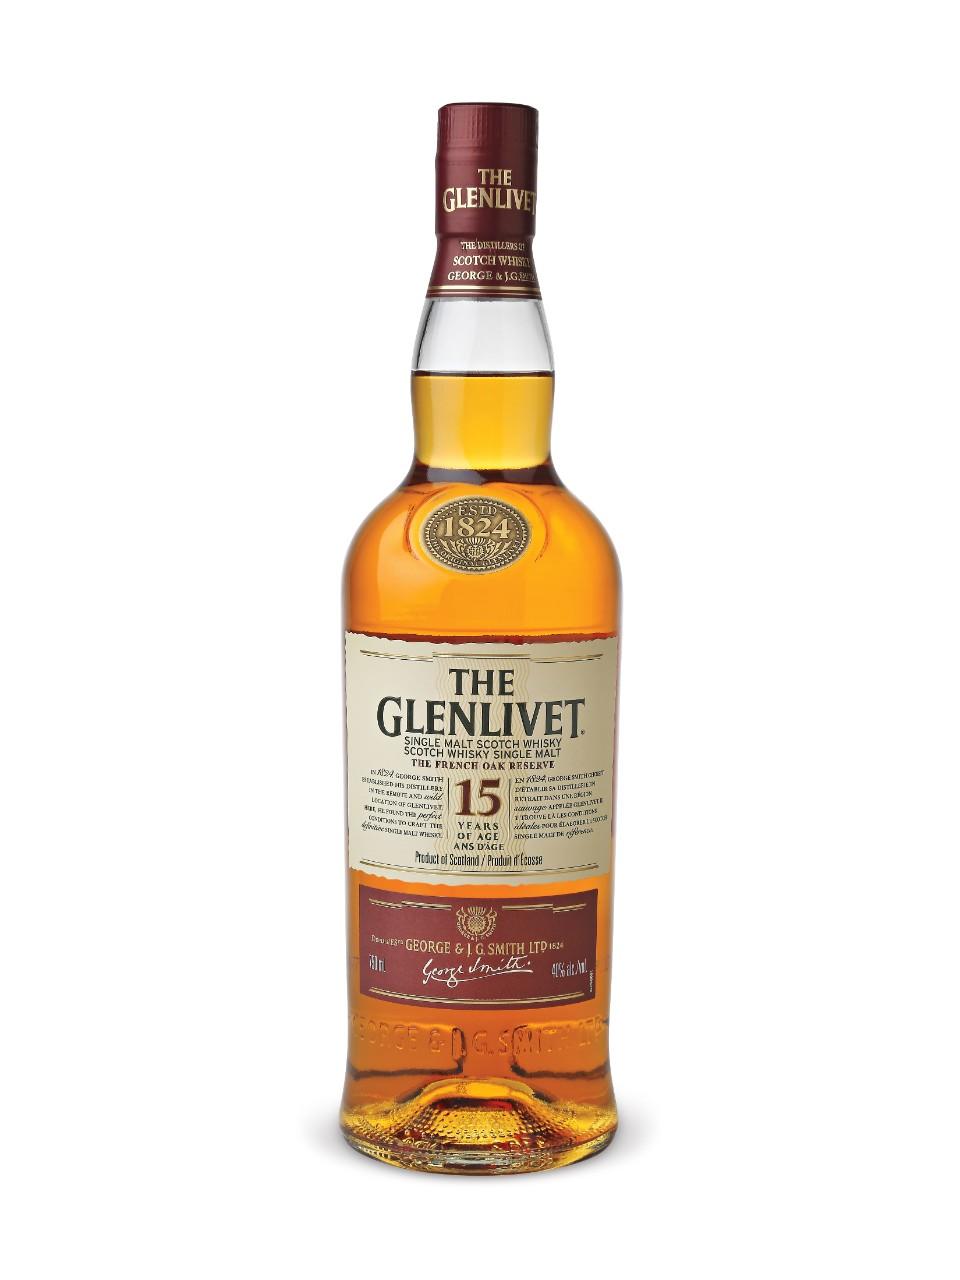 The Glenlivet French Oak Reserve 15 Year Old Single Malt Scotch Whisky